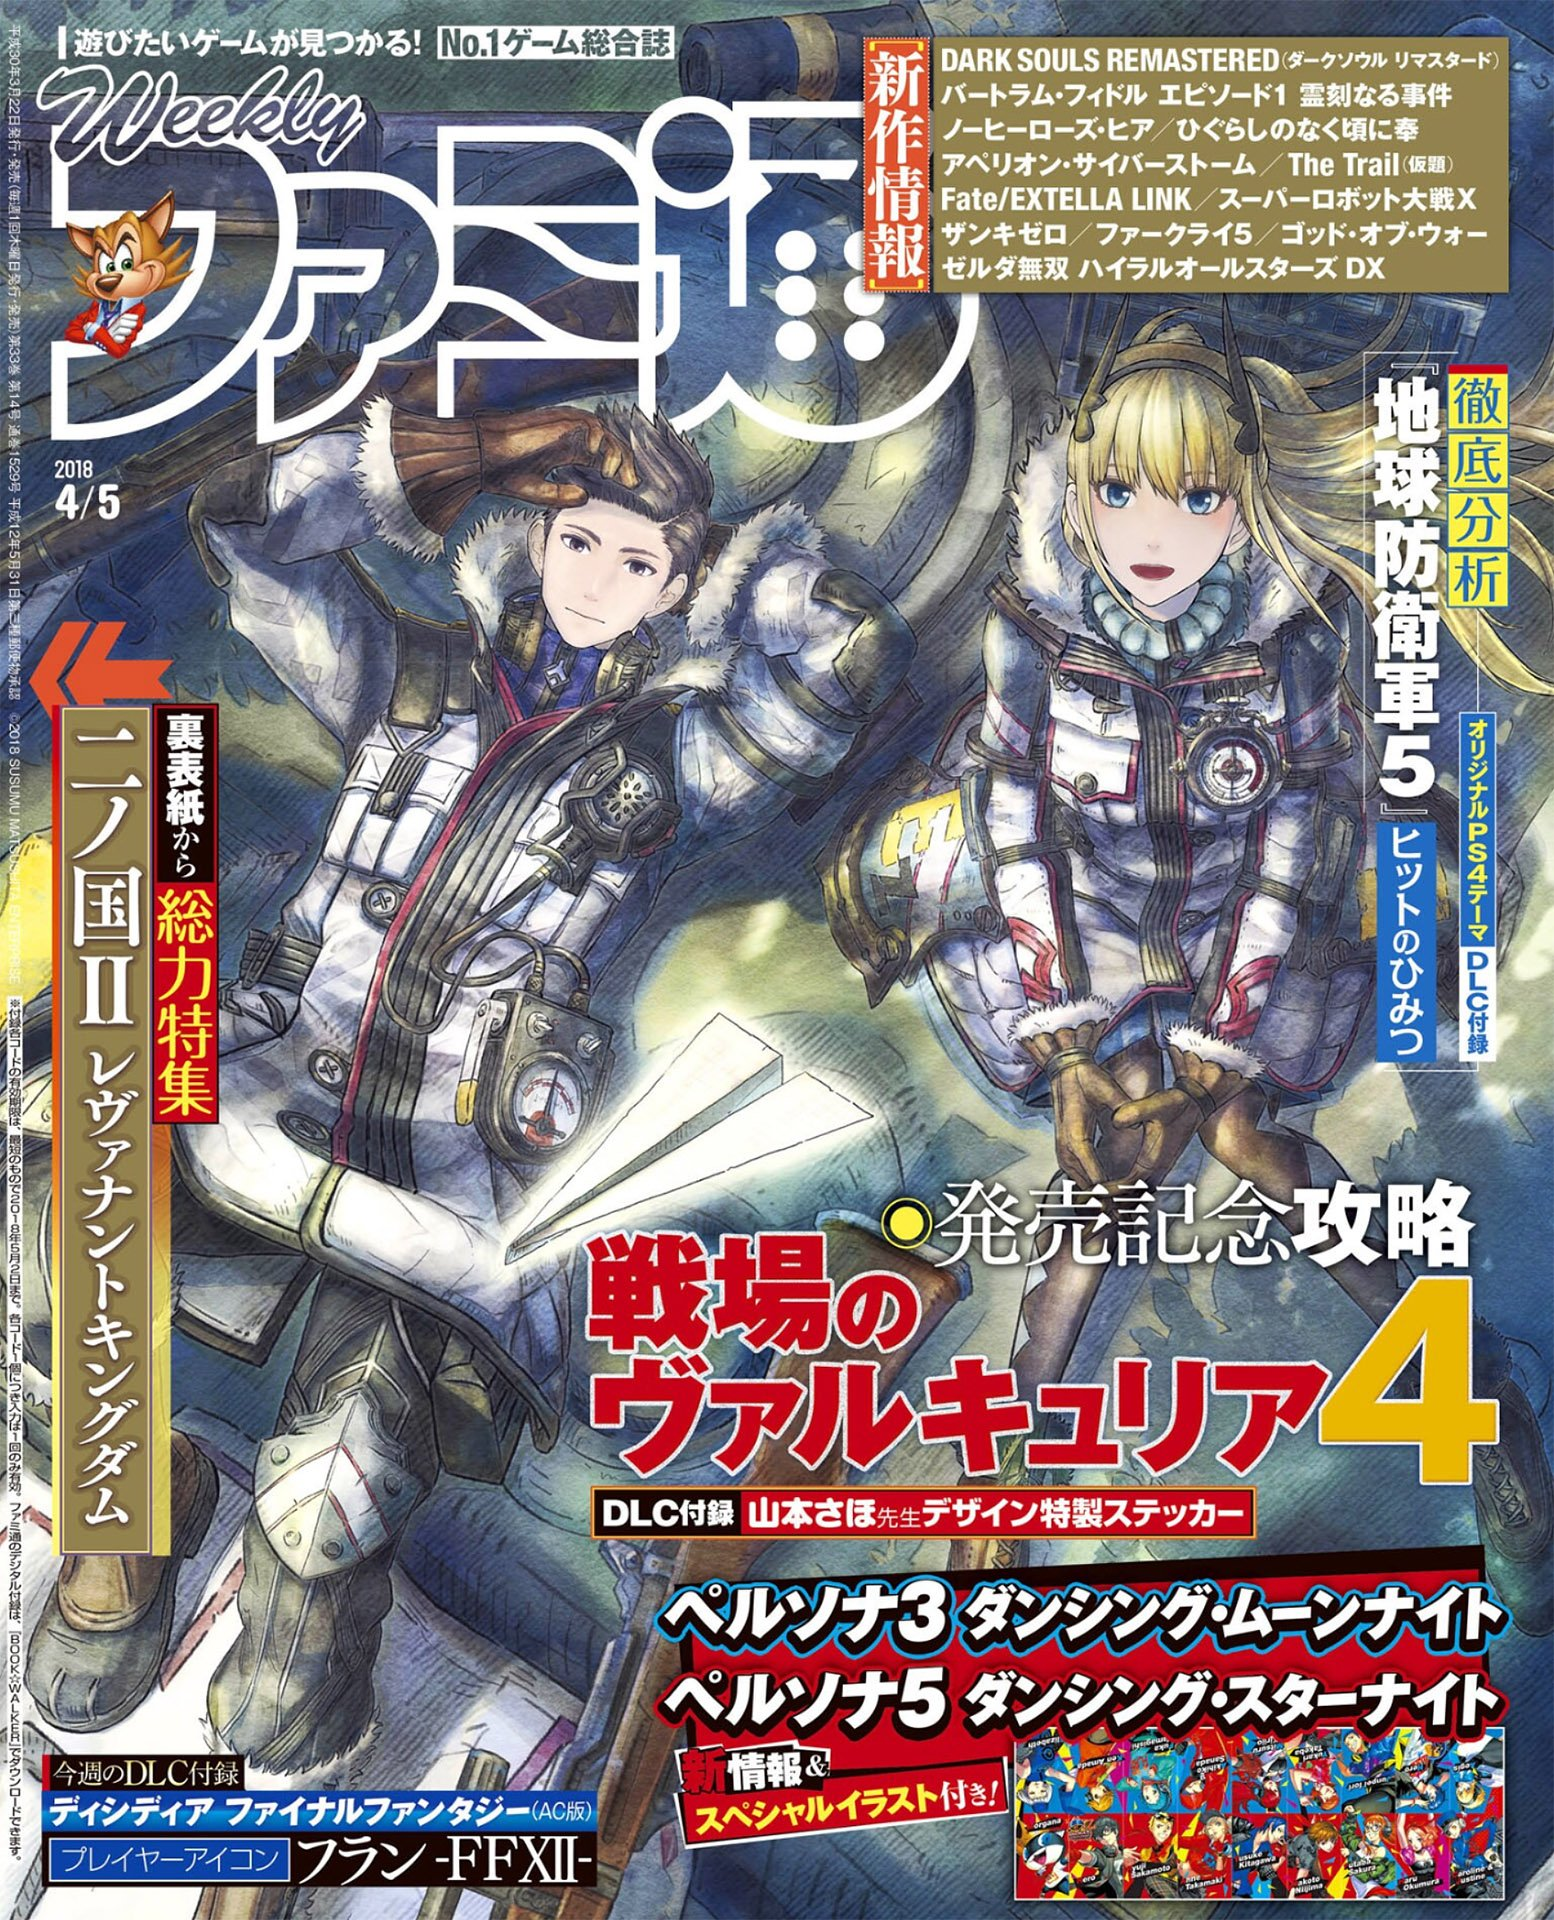 Famitsu 1529 (April 5, 2018)